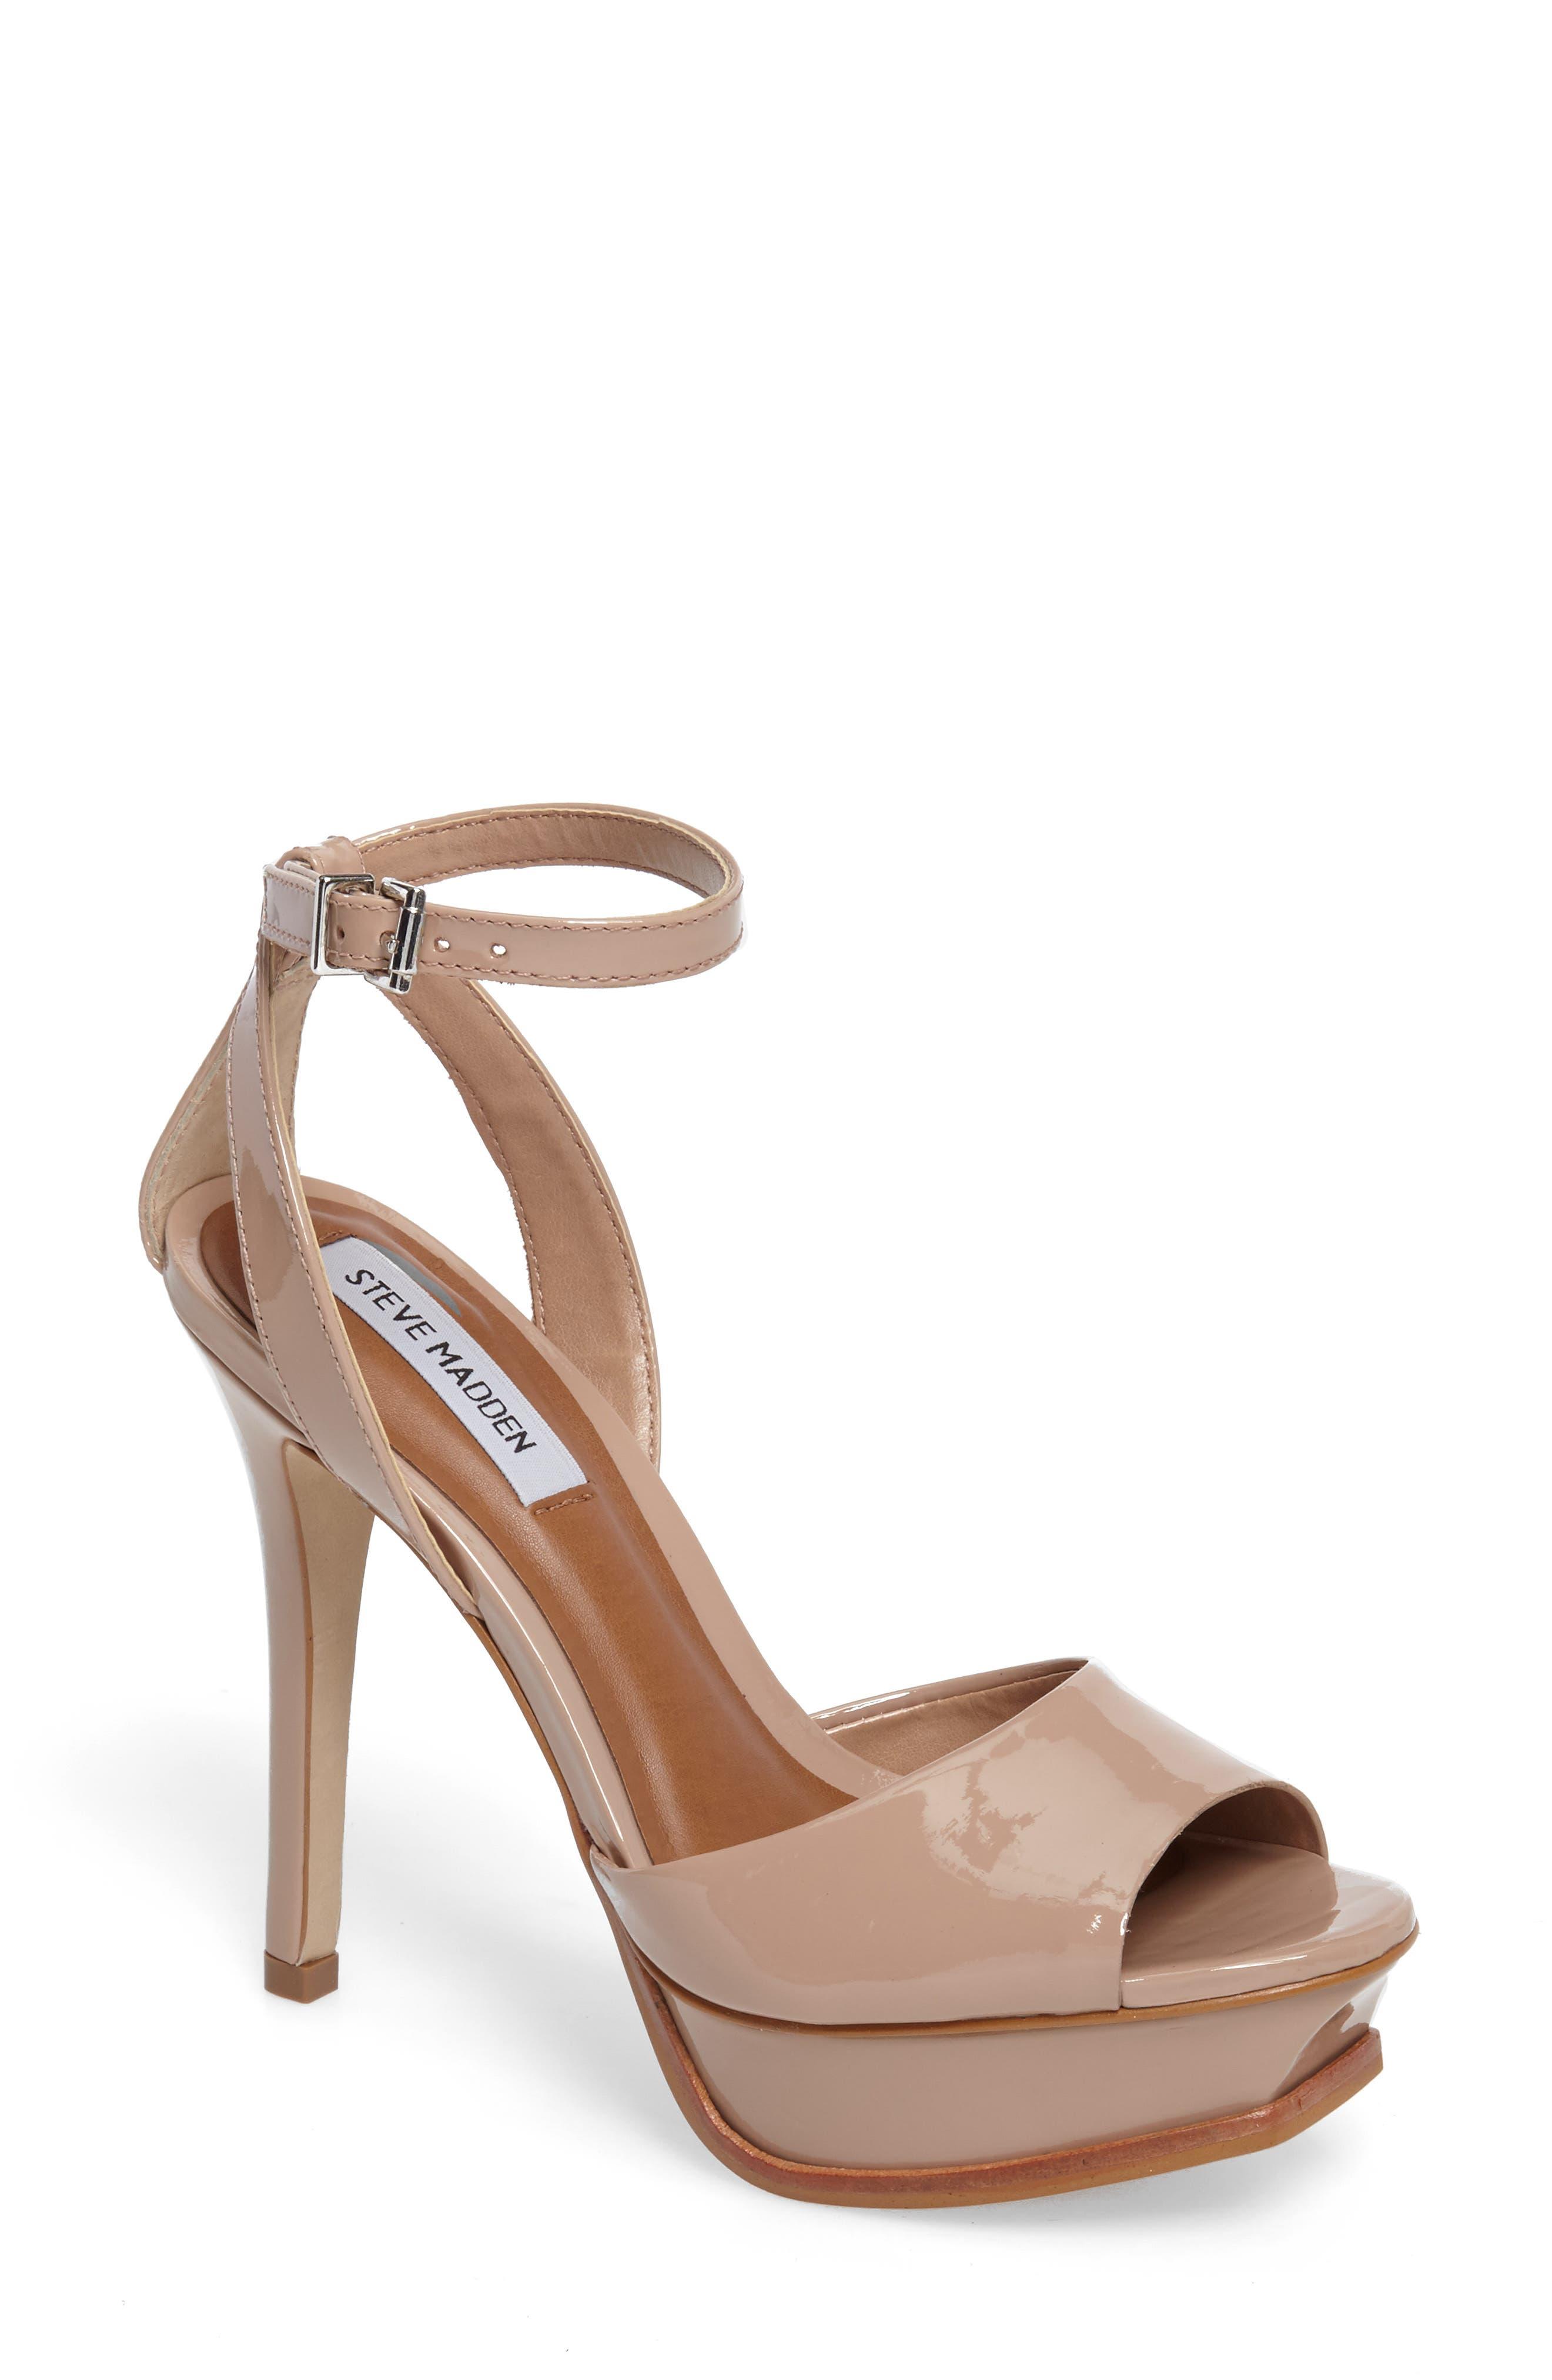 Main Image - Steve Madden Karmina Platform Sandal (Women)